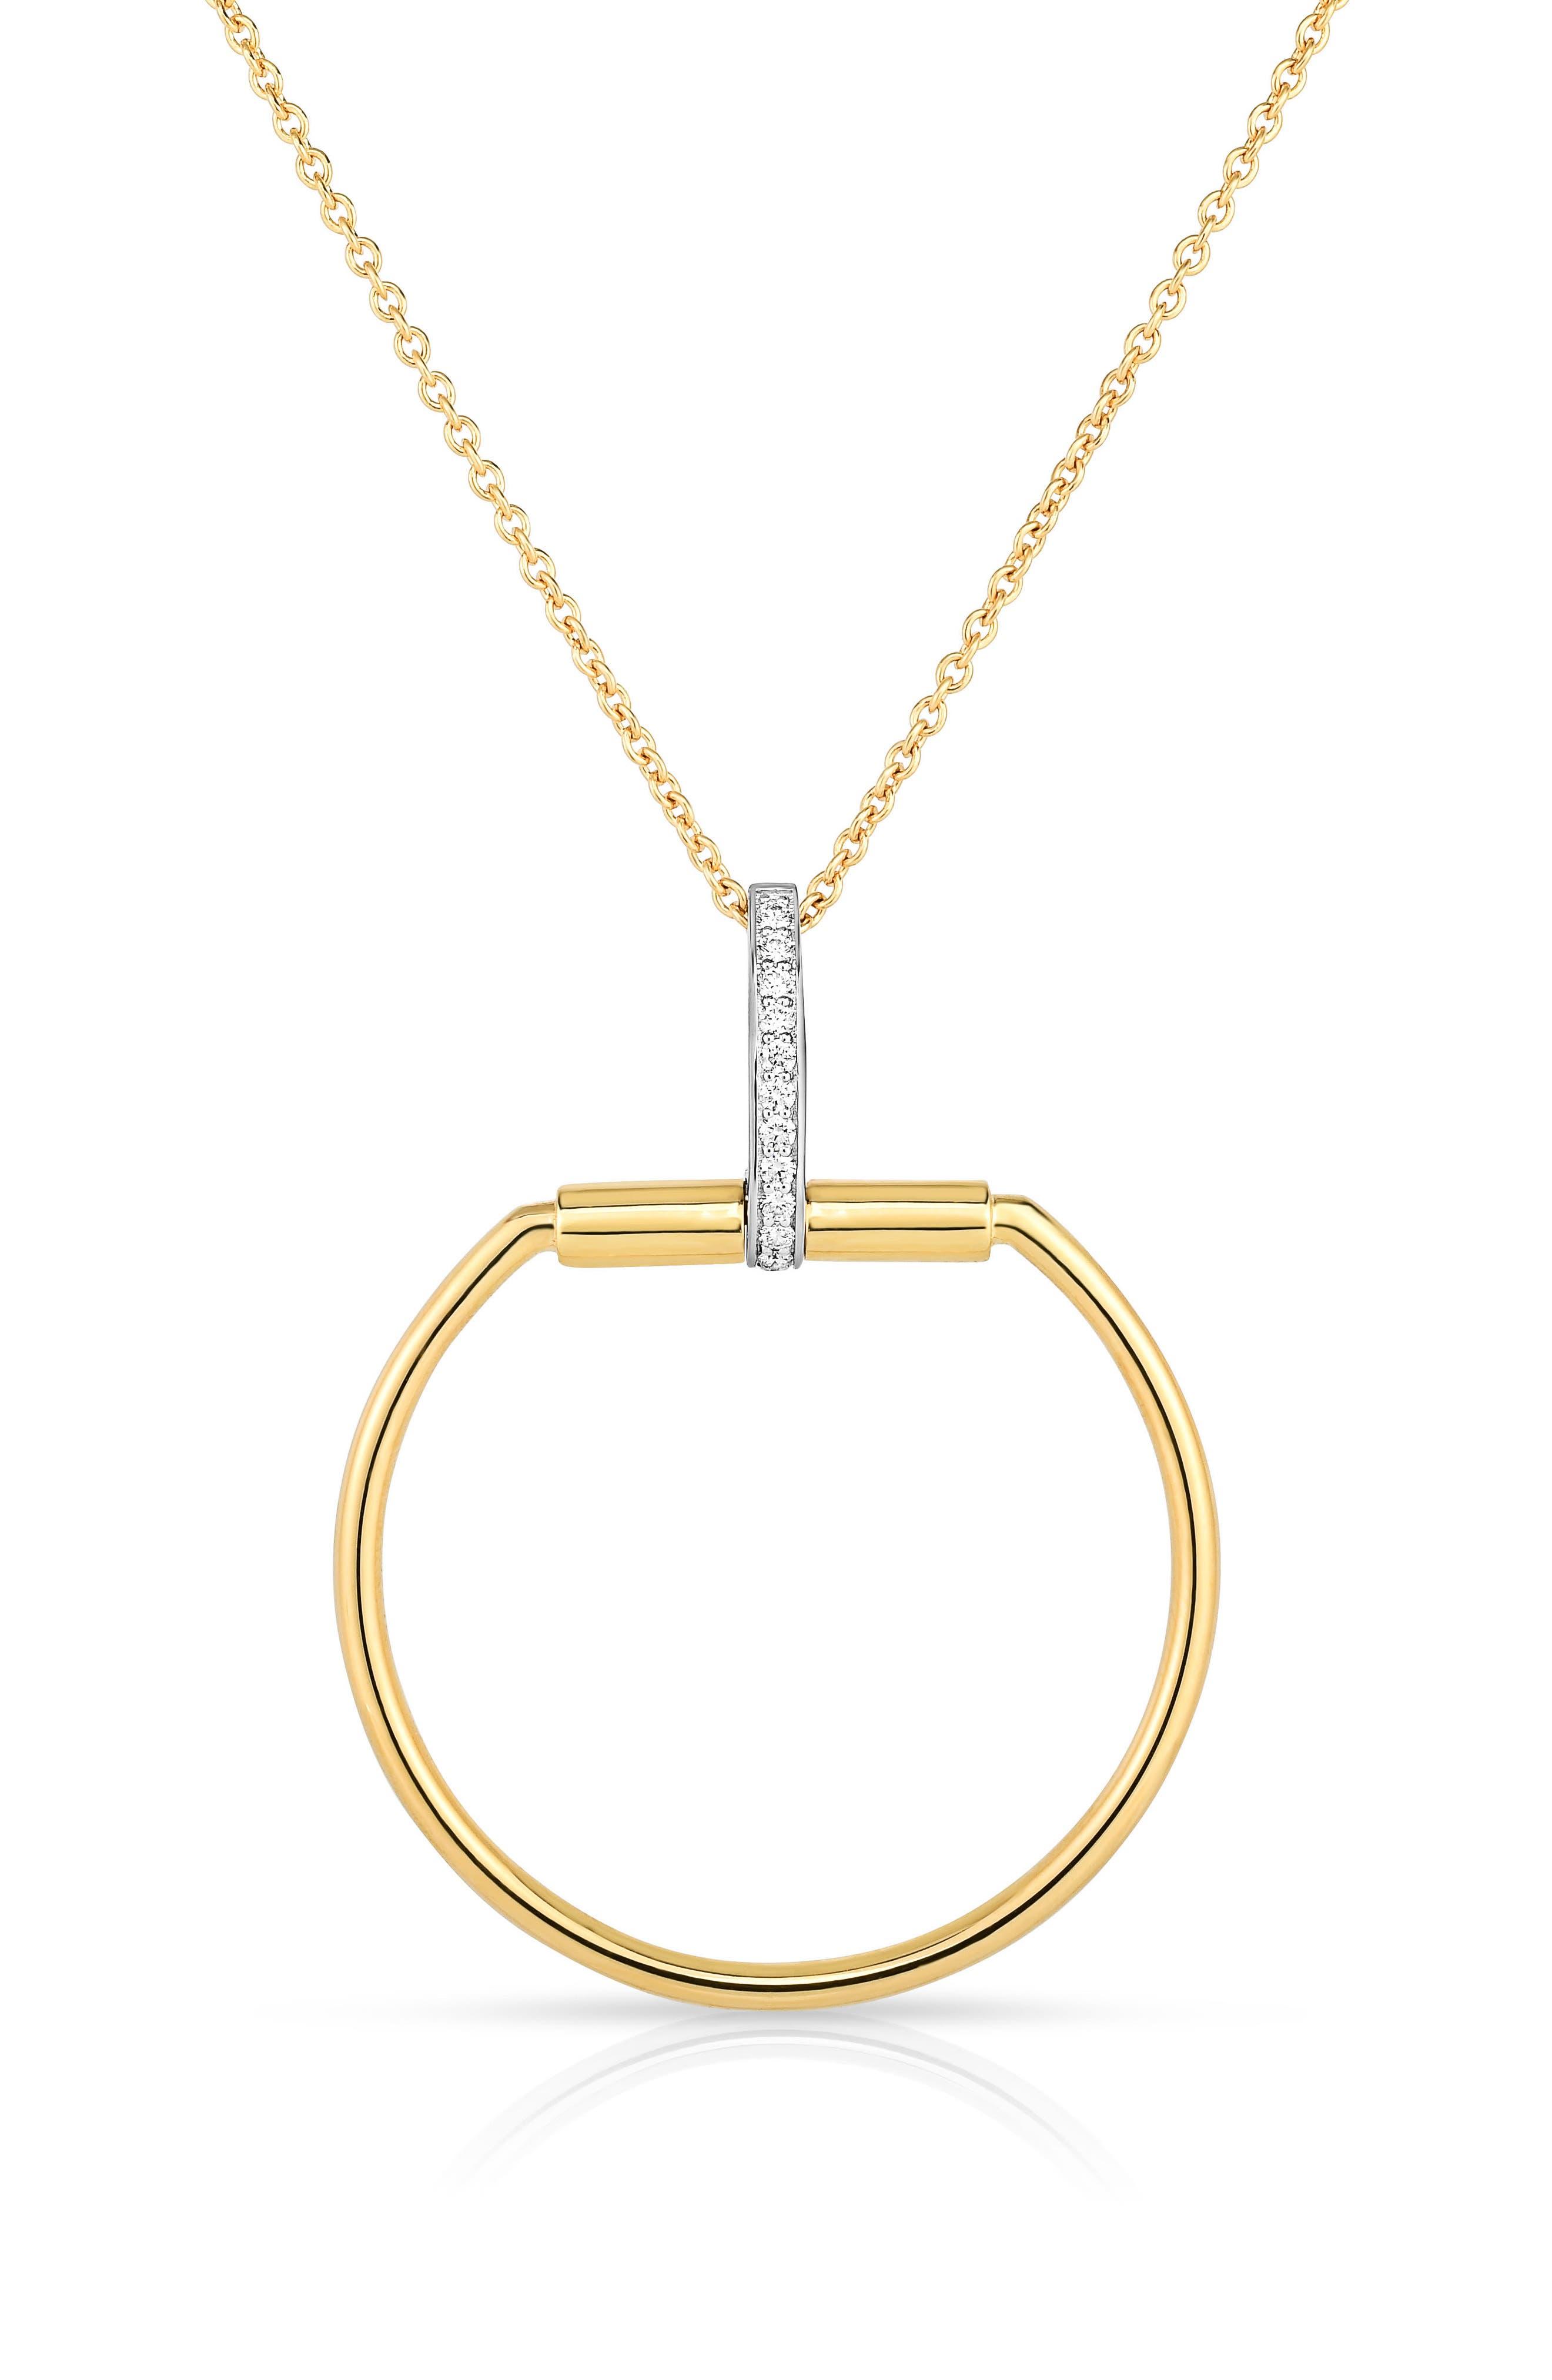 Classica Parisienne Diamond Pendant Necklace,                         Main,                         color, Yellow Gold